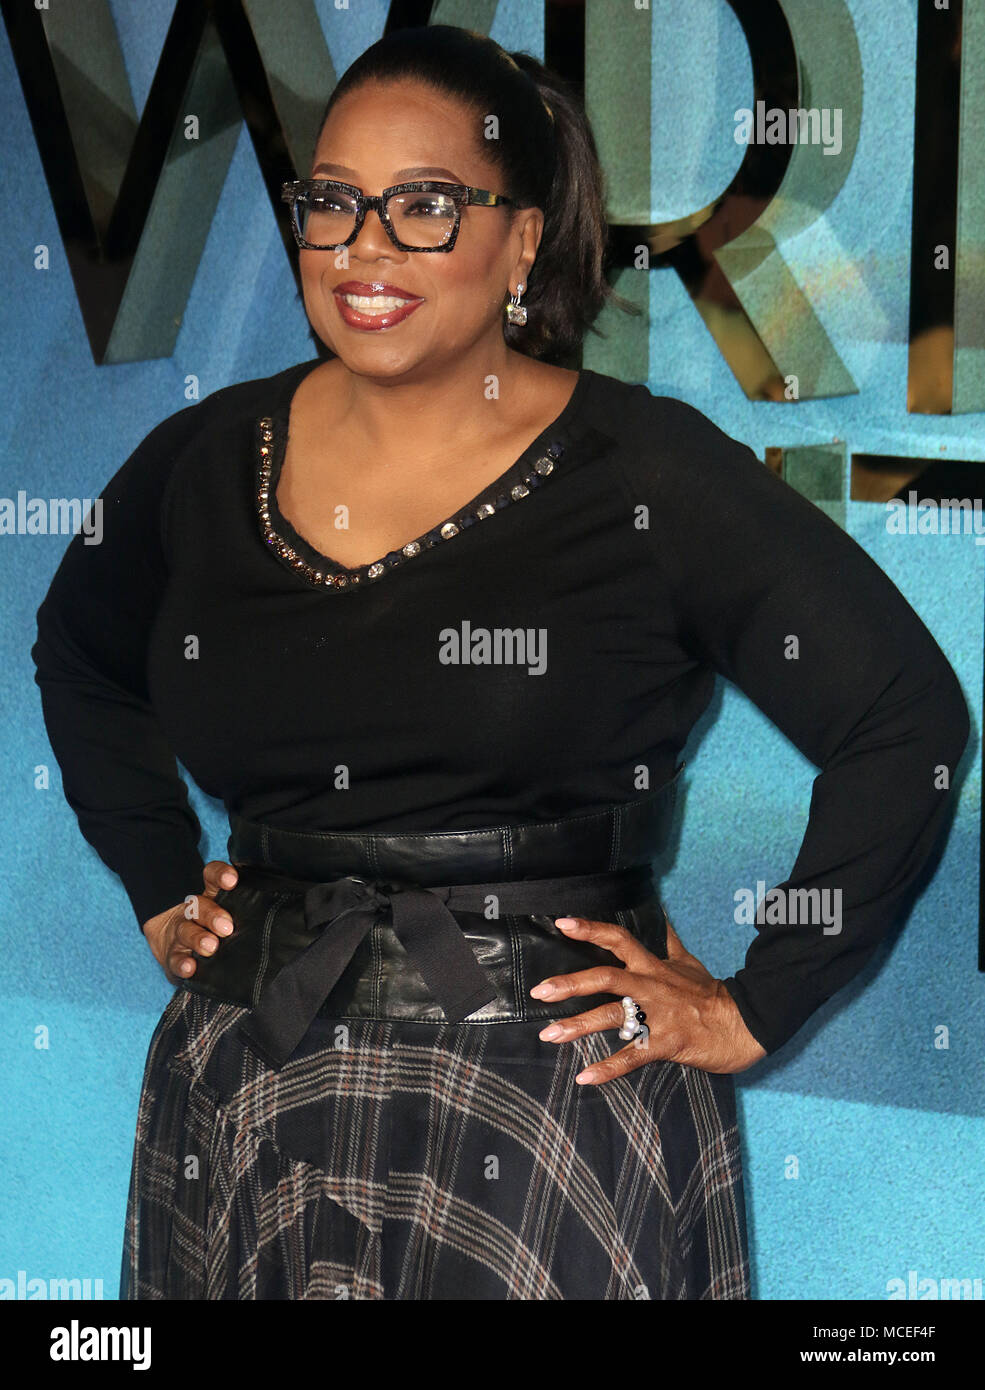 Mar 13, 2018  - Oprah Winfrey attending European Premiere of A Wrinkle in Time, BFI IMAX in London, England, UK - Stock Image